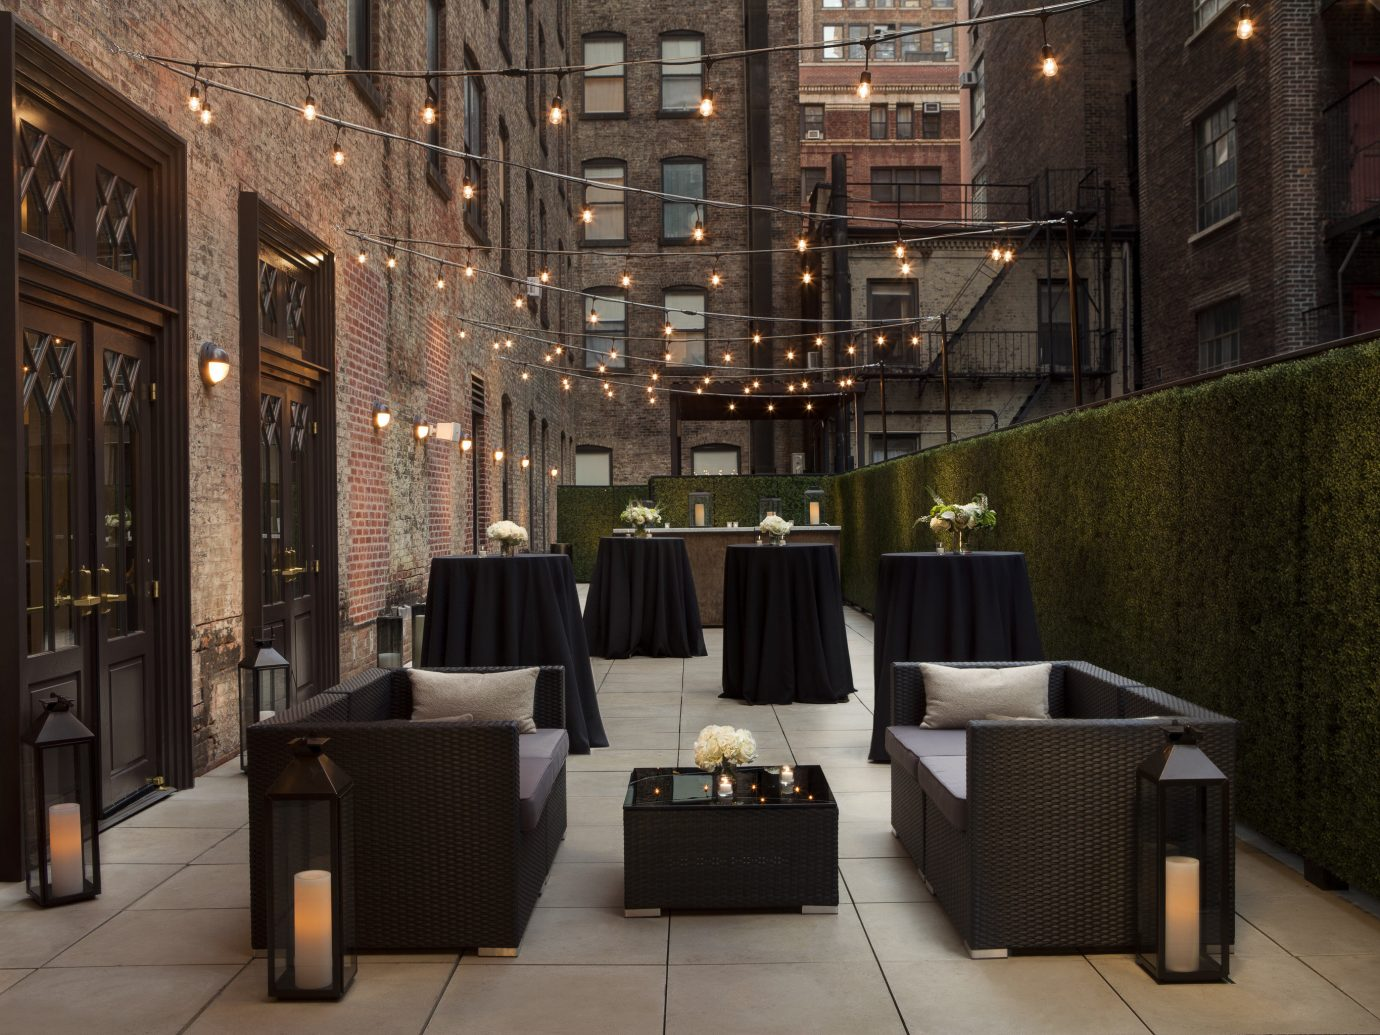 Hotels chair Lobby interior design restaurant Design estate Bar area